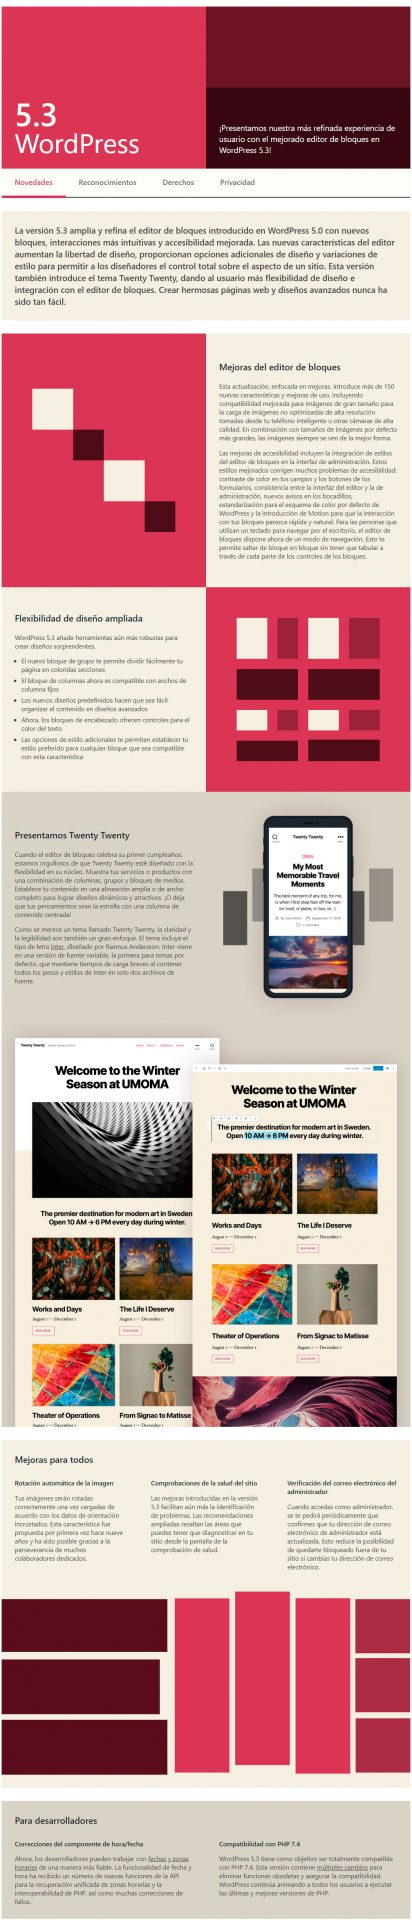 Novedades WordPress 5.3